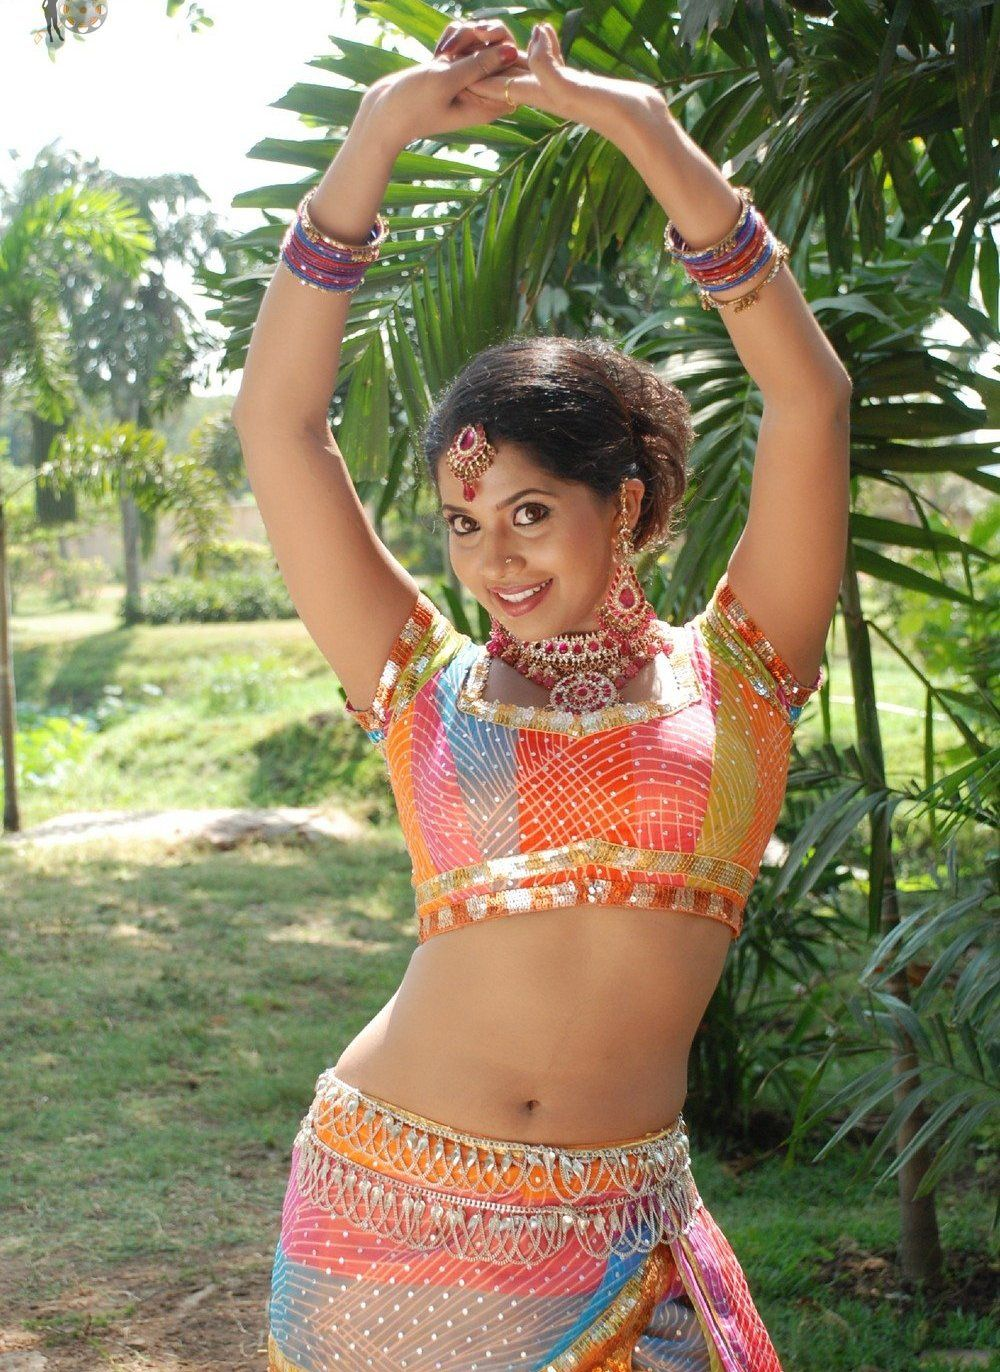 Khushbu Thakkar 2009,Susan Eisenberg Erotic clip Connie Needham,Yui Ichikawa (b. 1986 Later became an actress.